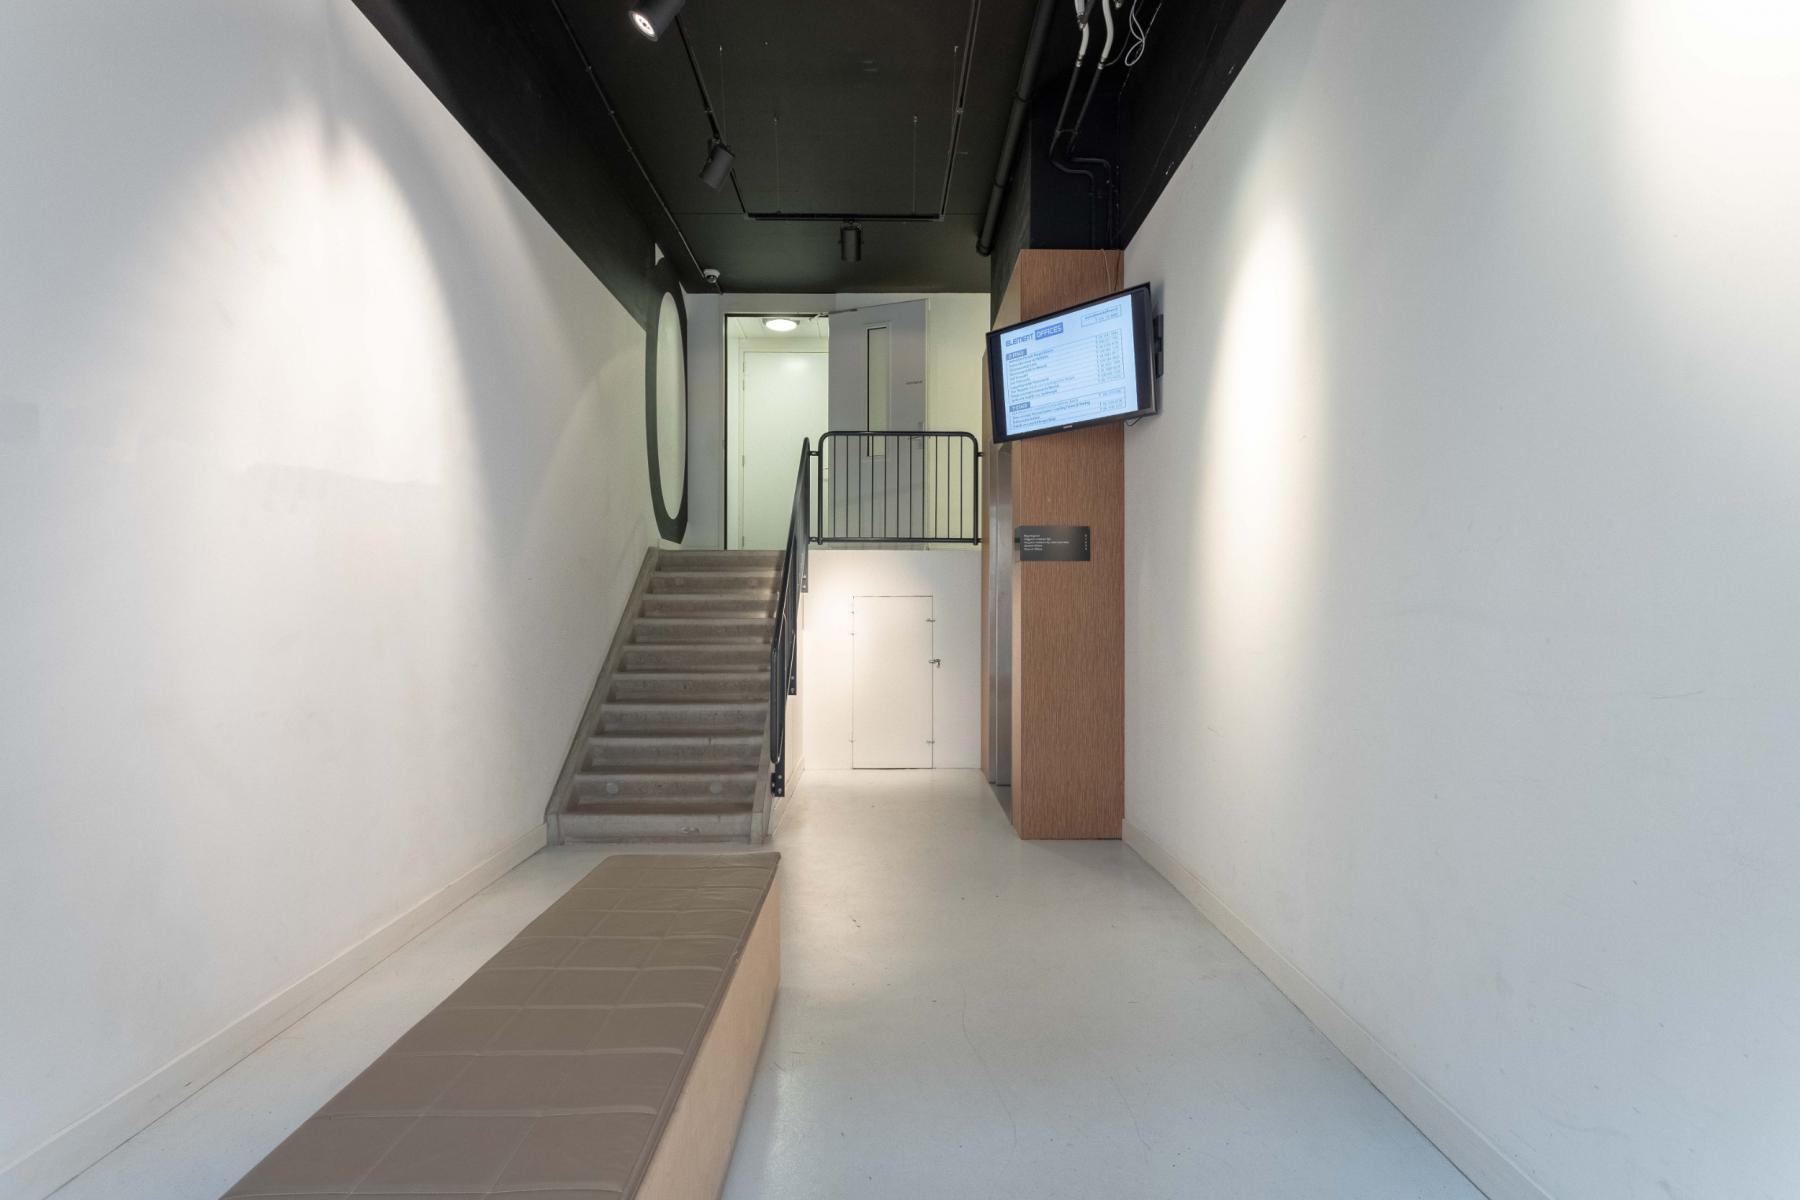 centrale hal Utrecht ingang trappenhuis en lift